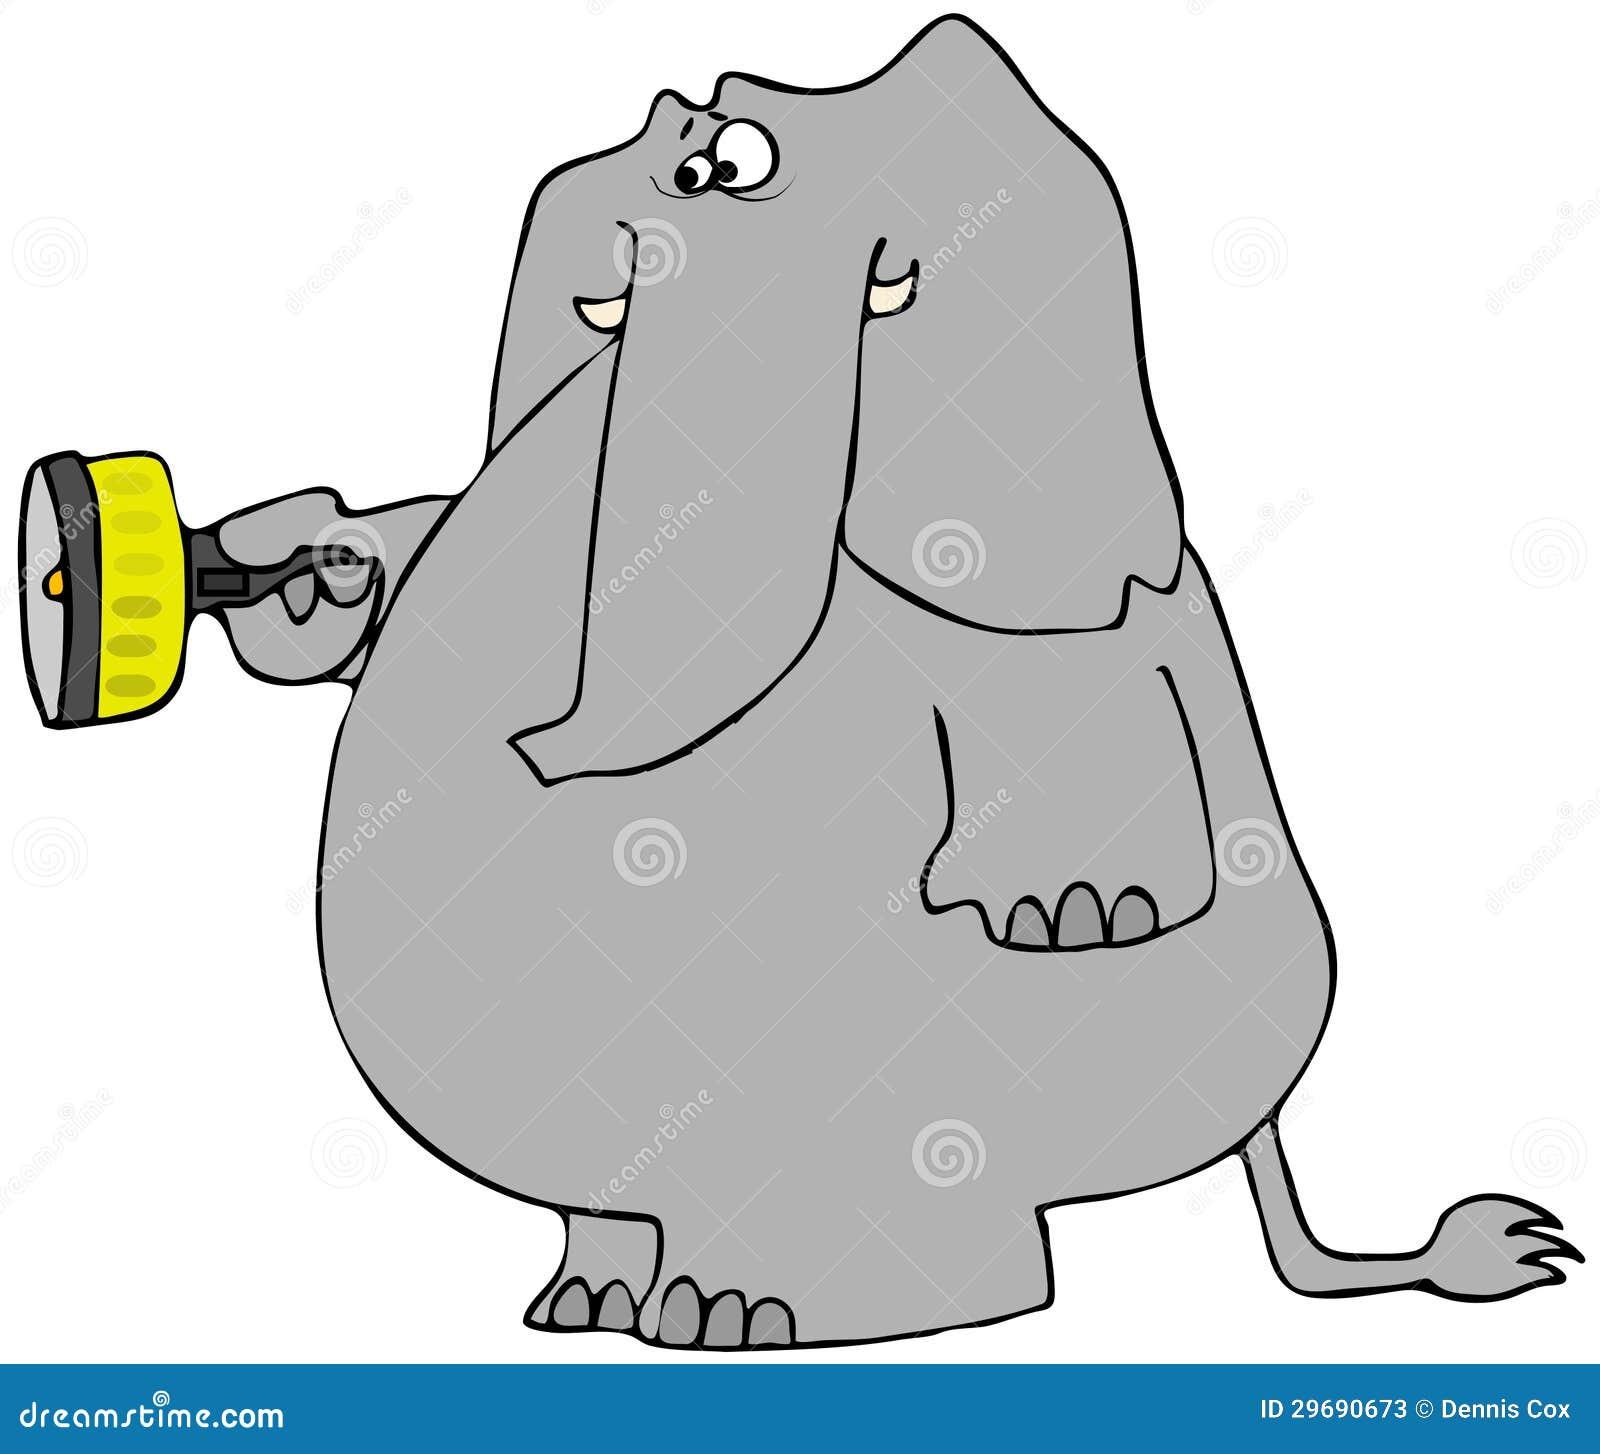 Scared Elephant With A Flashlight Stock Photos - Image ...